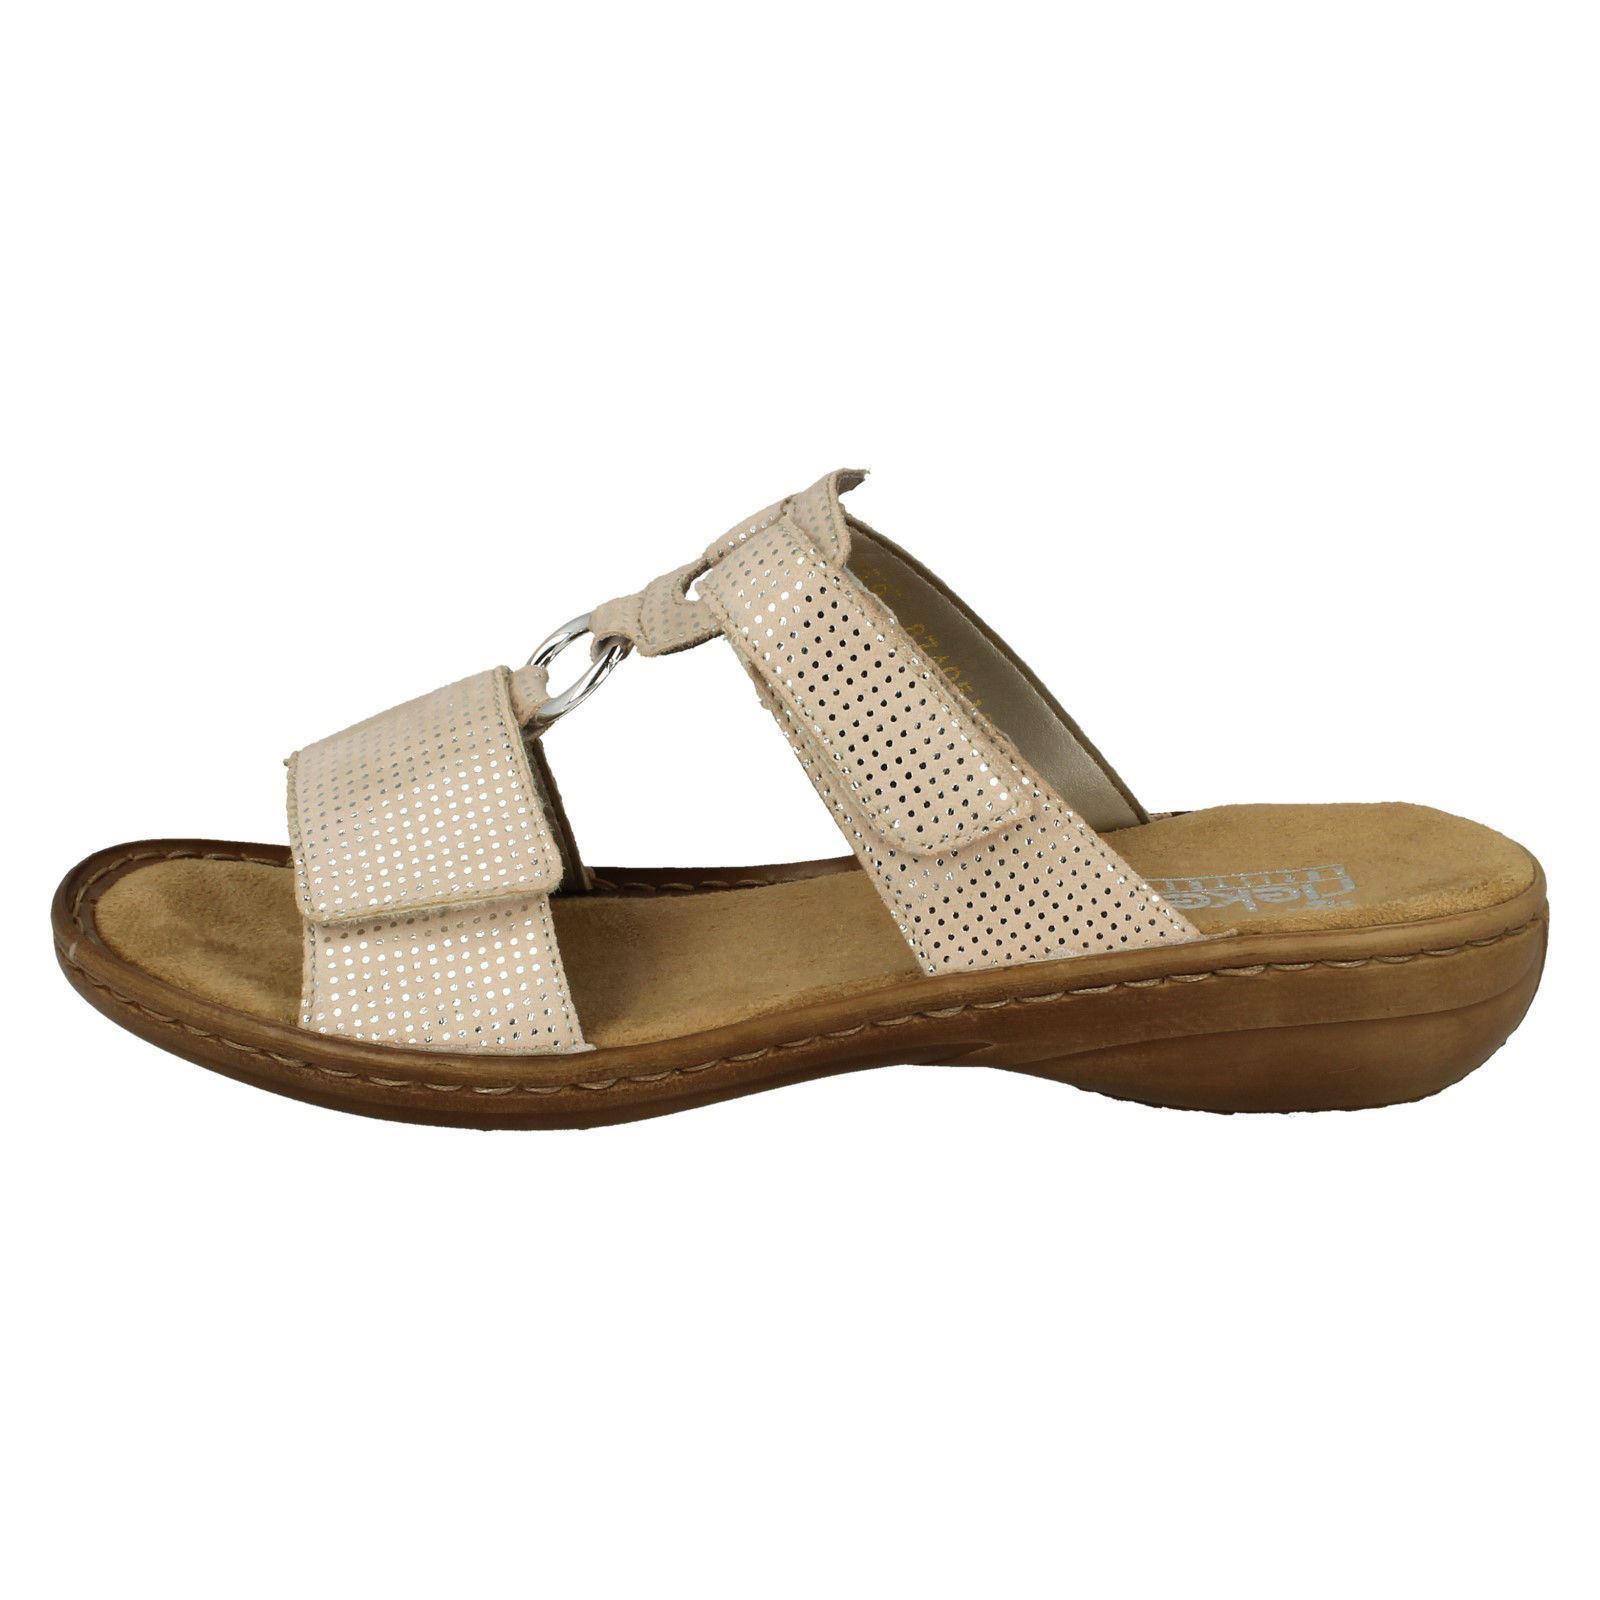 608p9 Slip On Femmes Mule Beige Rieker Sandals q5f50Xw